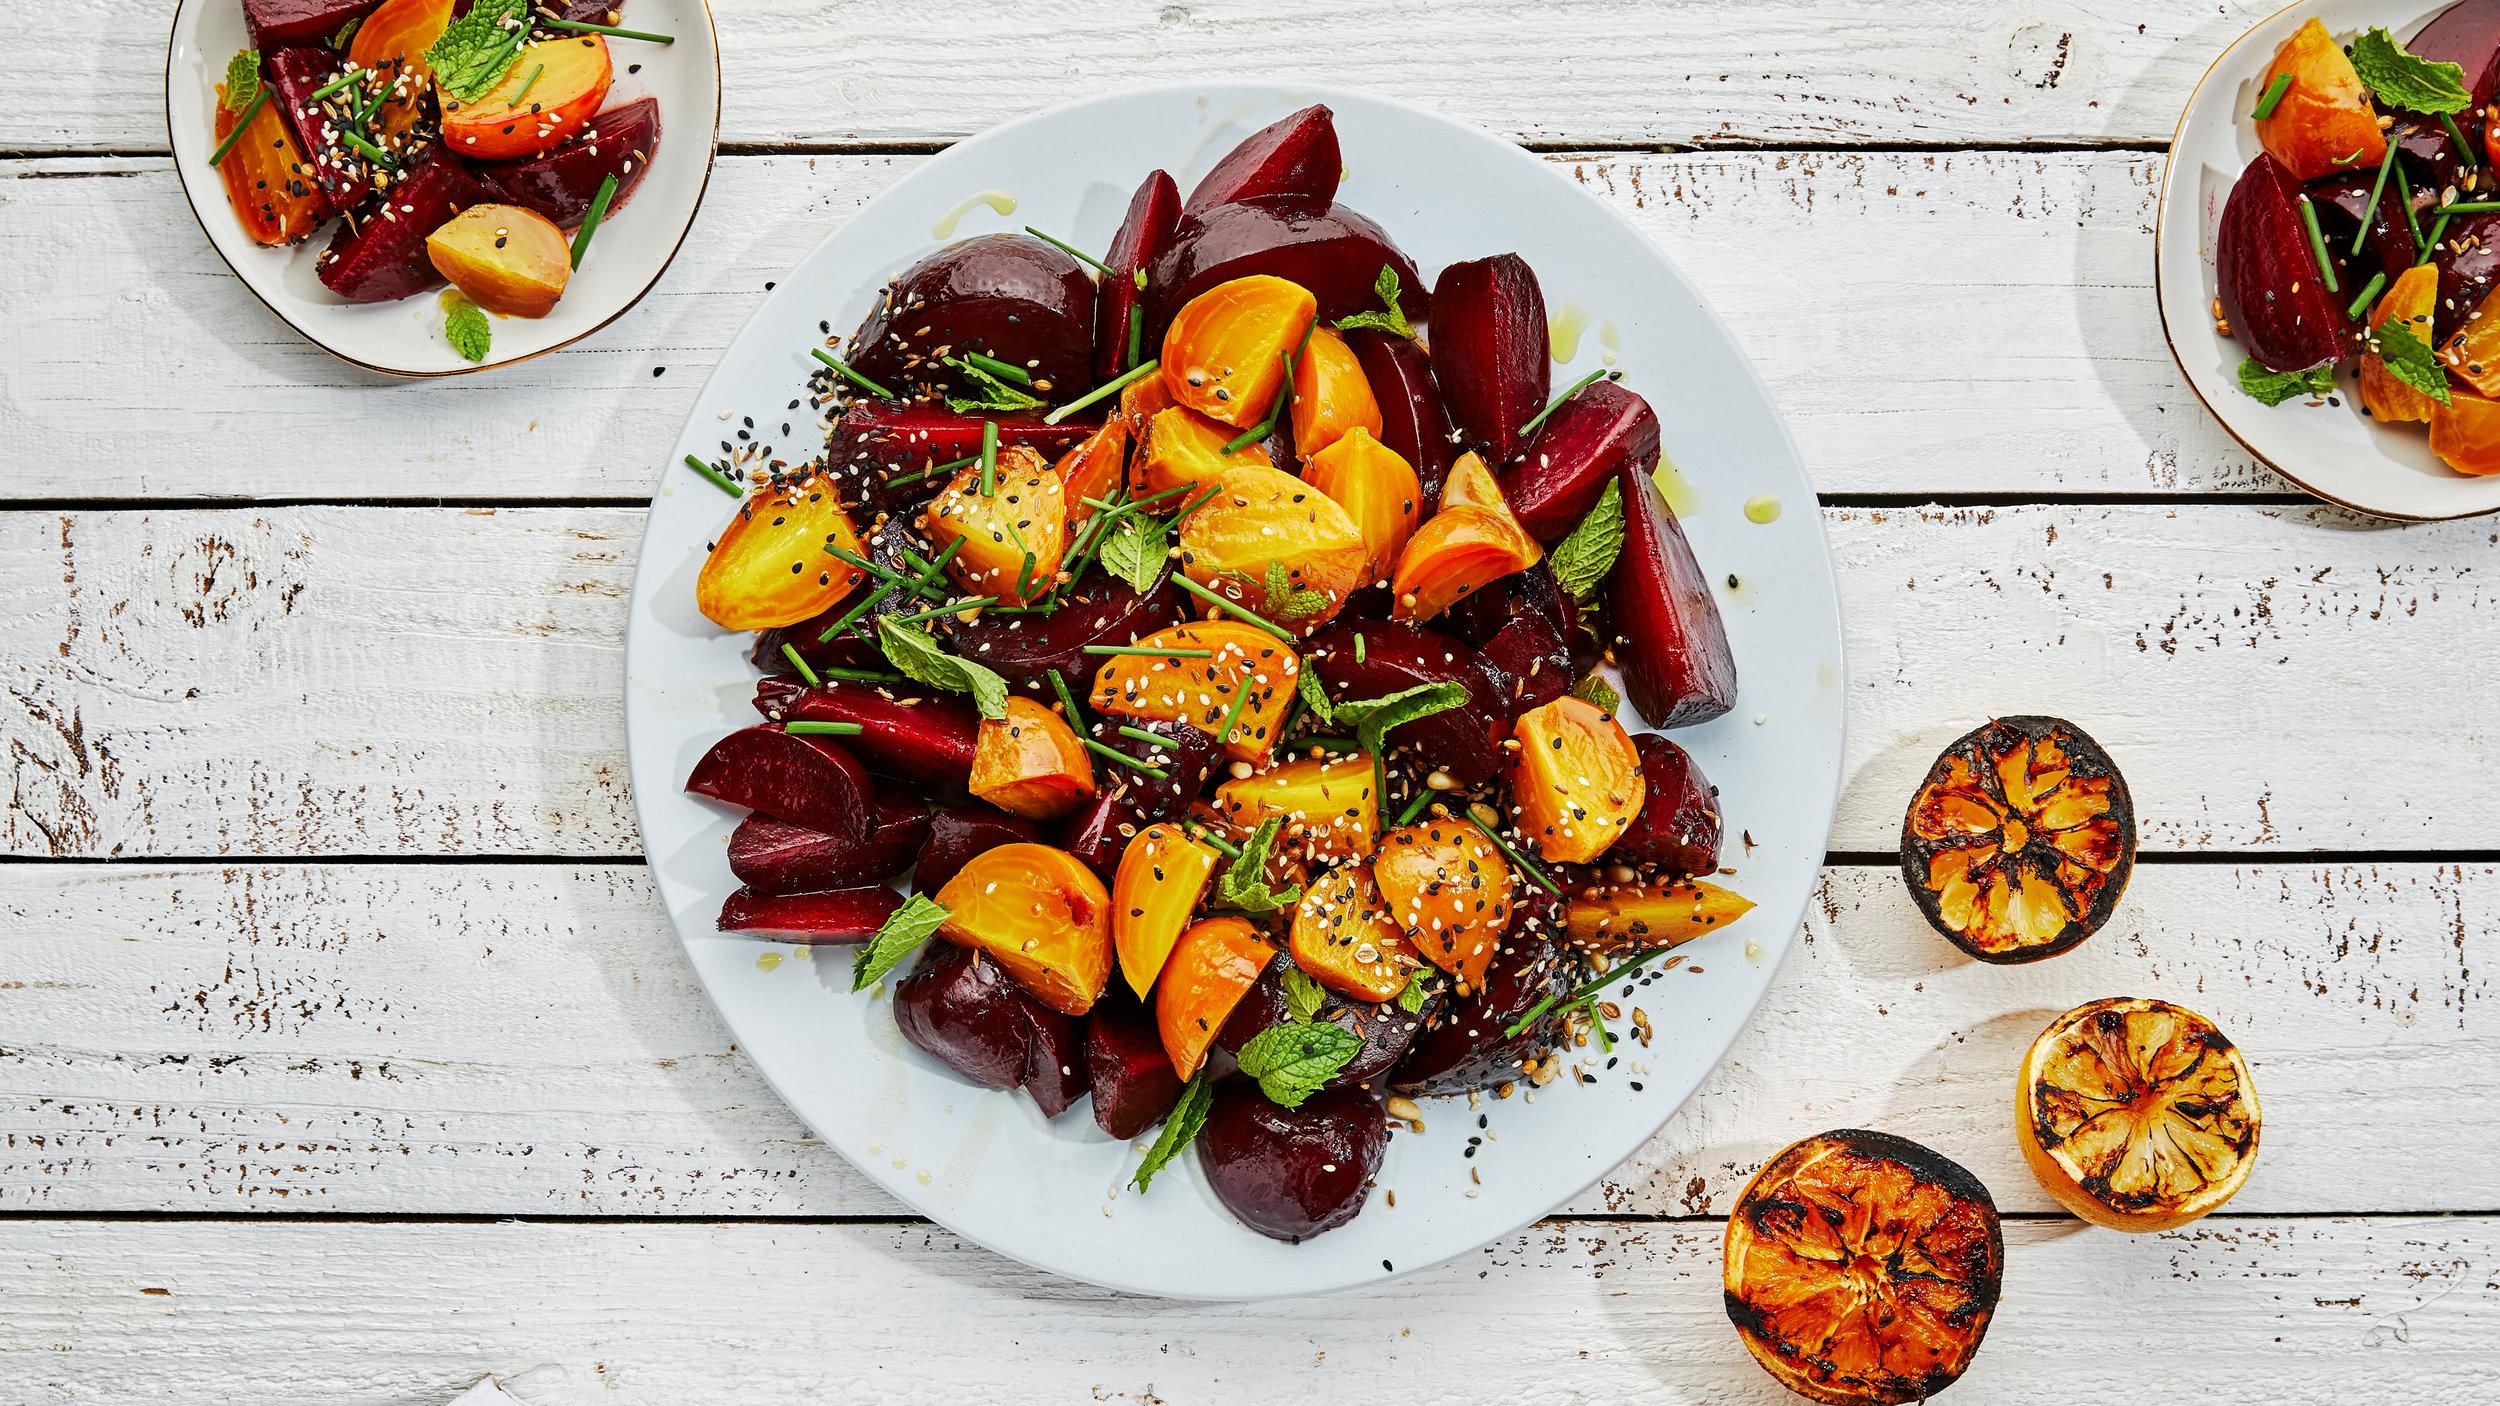 Grilled Beet & Charred Citrus Salad